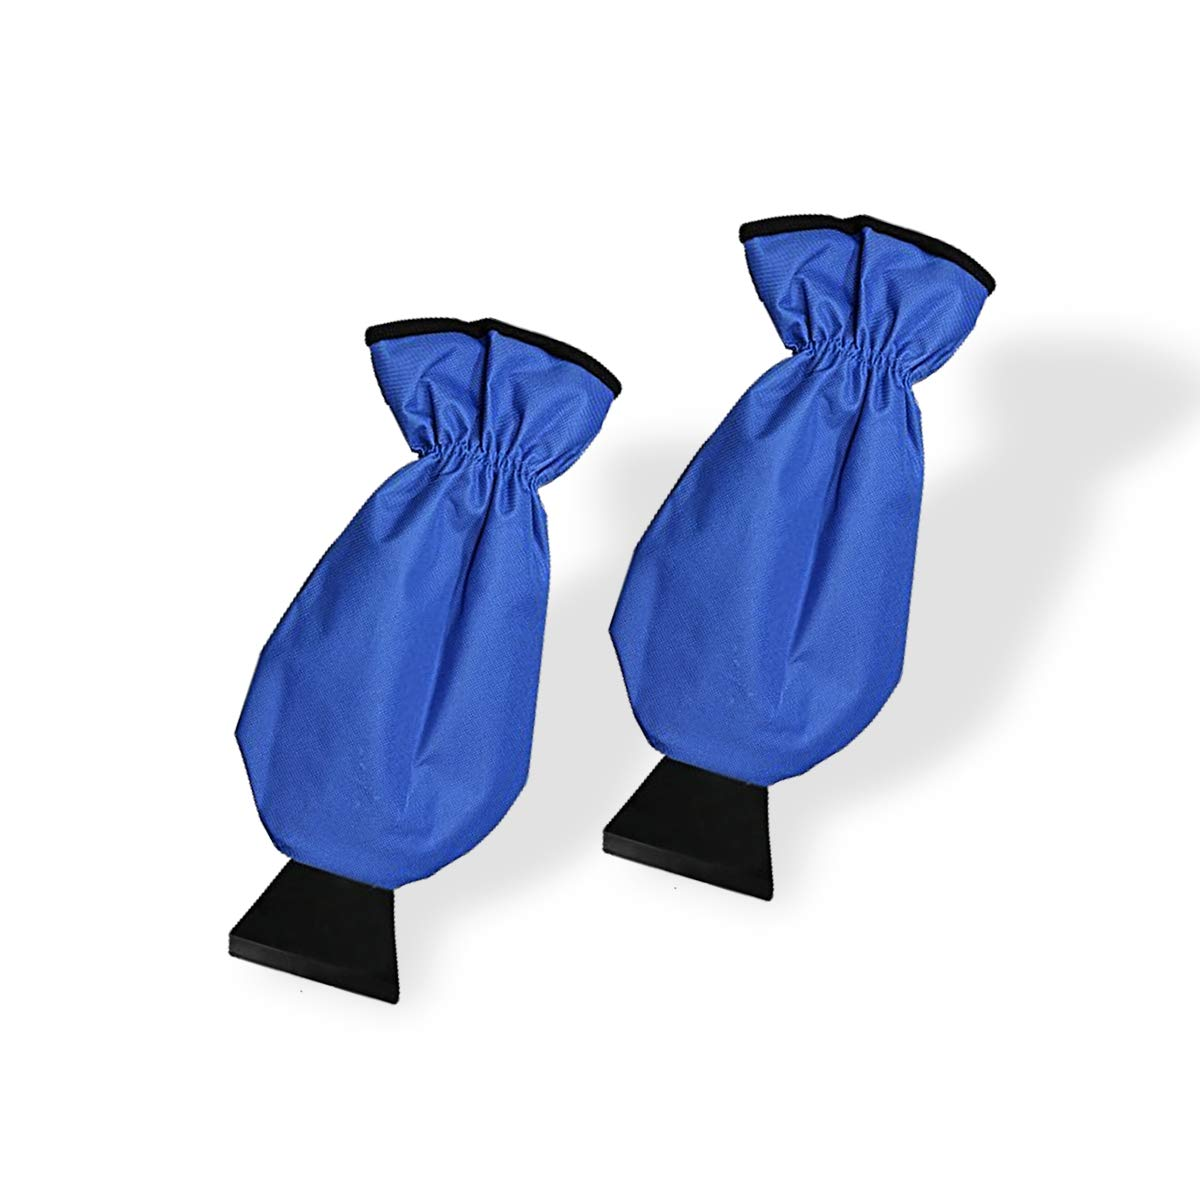 VaygWay Ice Scraper Mitt For Car Windshield Snow Remover and Scrapers Waterproof Glove Blue 2-Pack Custom Autos